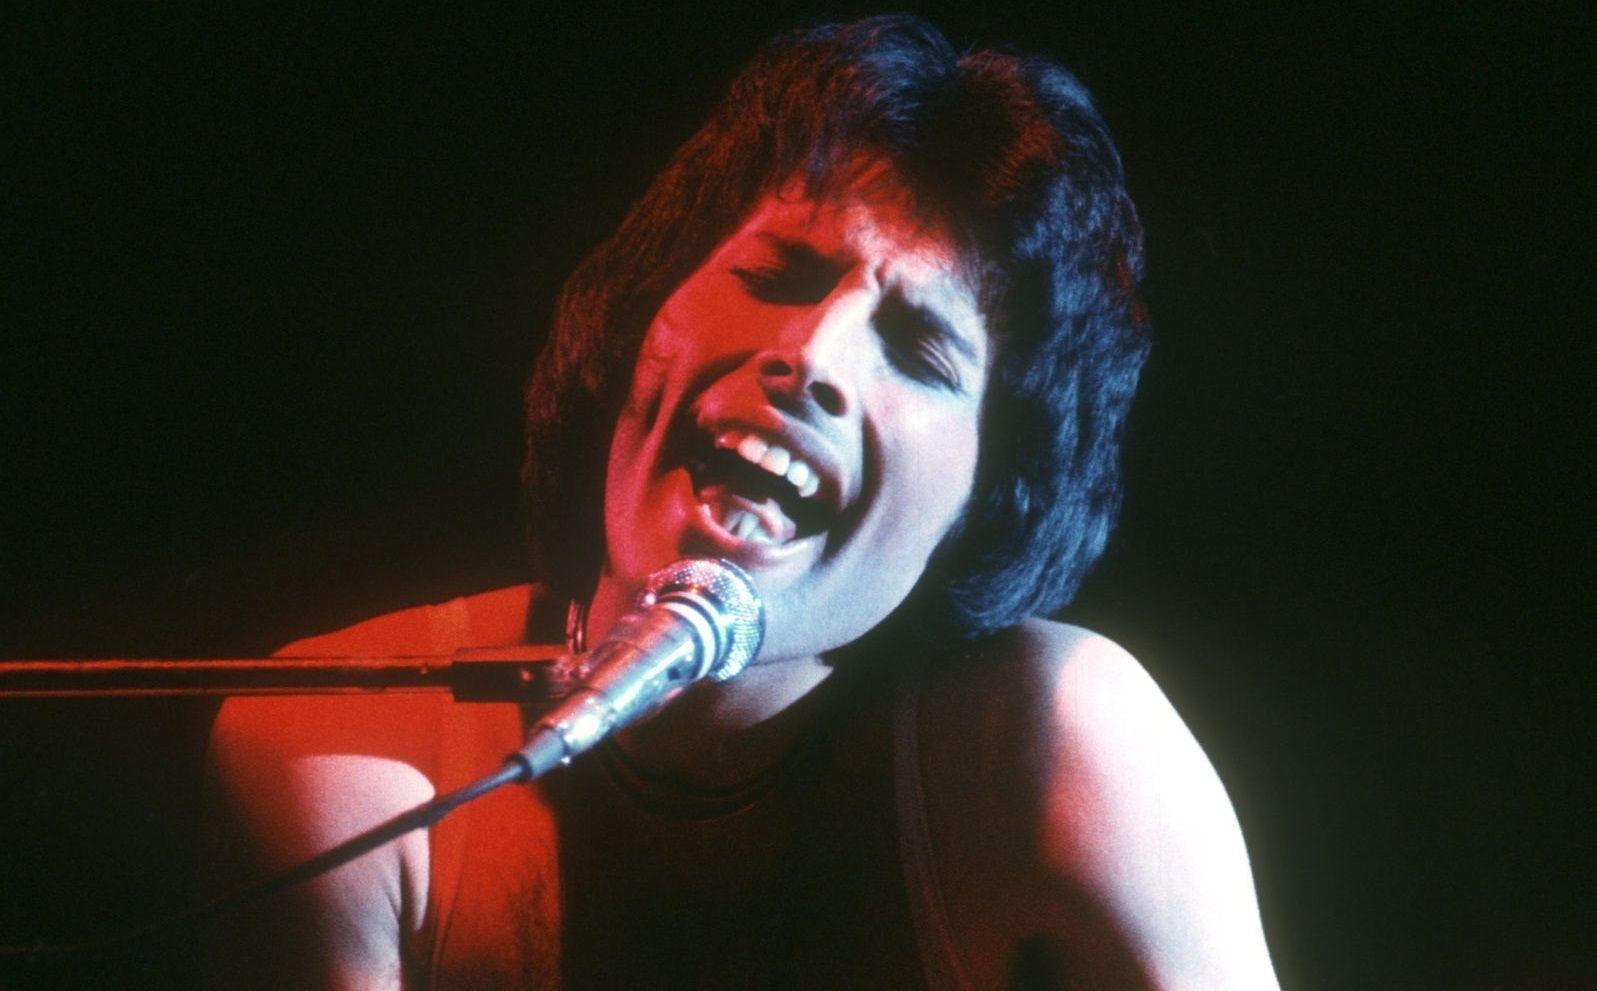 Freddie Mercury The Night Comes Down